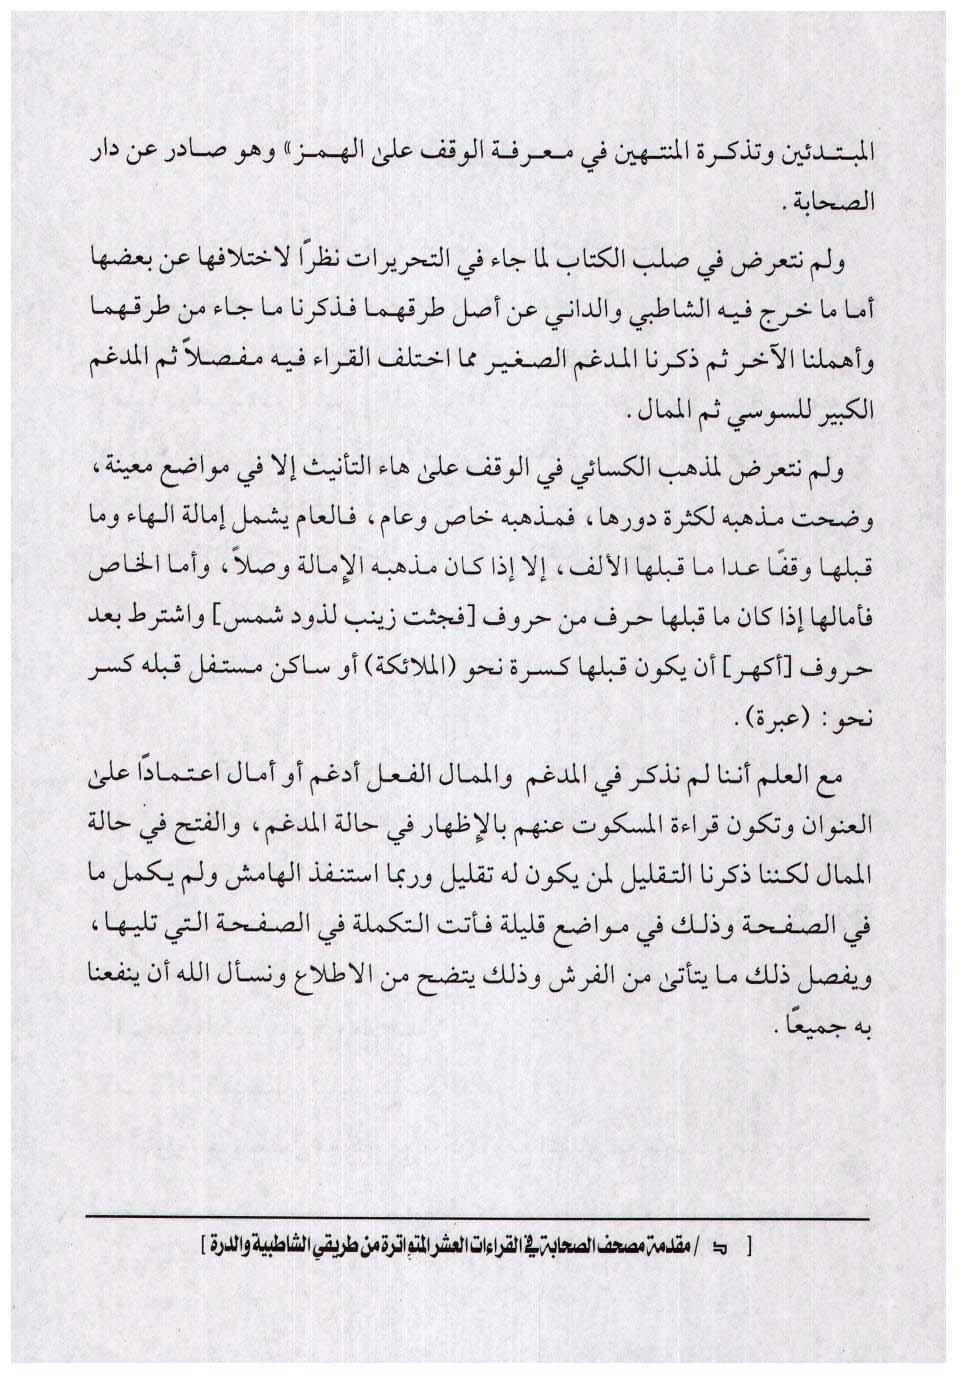 Pin By القران الكريم The Holy Quran On مصحف الصحابة في القراءات العشر المتواترة من طريق الشاطبية والدرة Math Math Equations